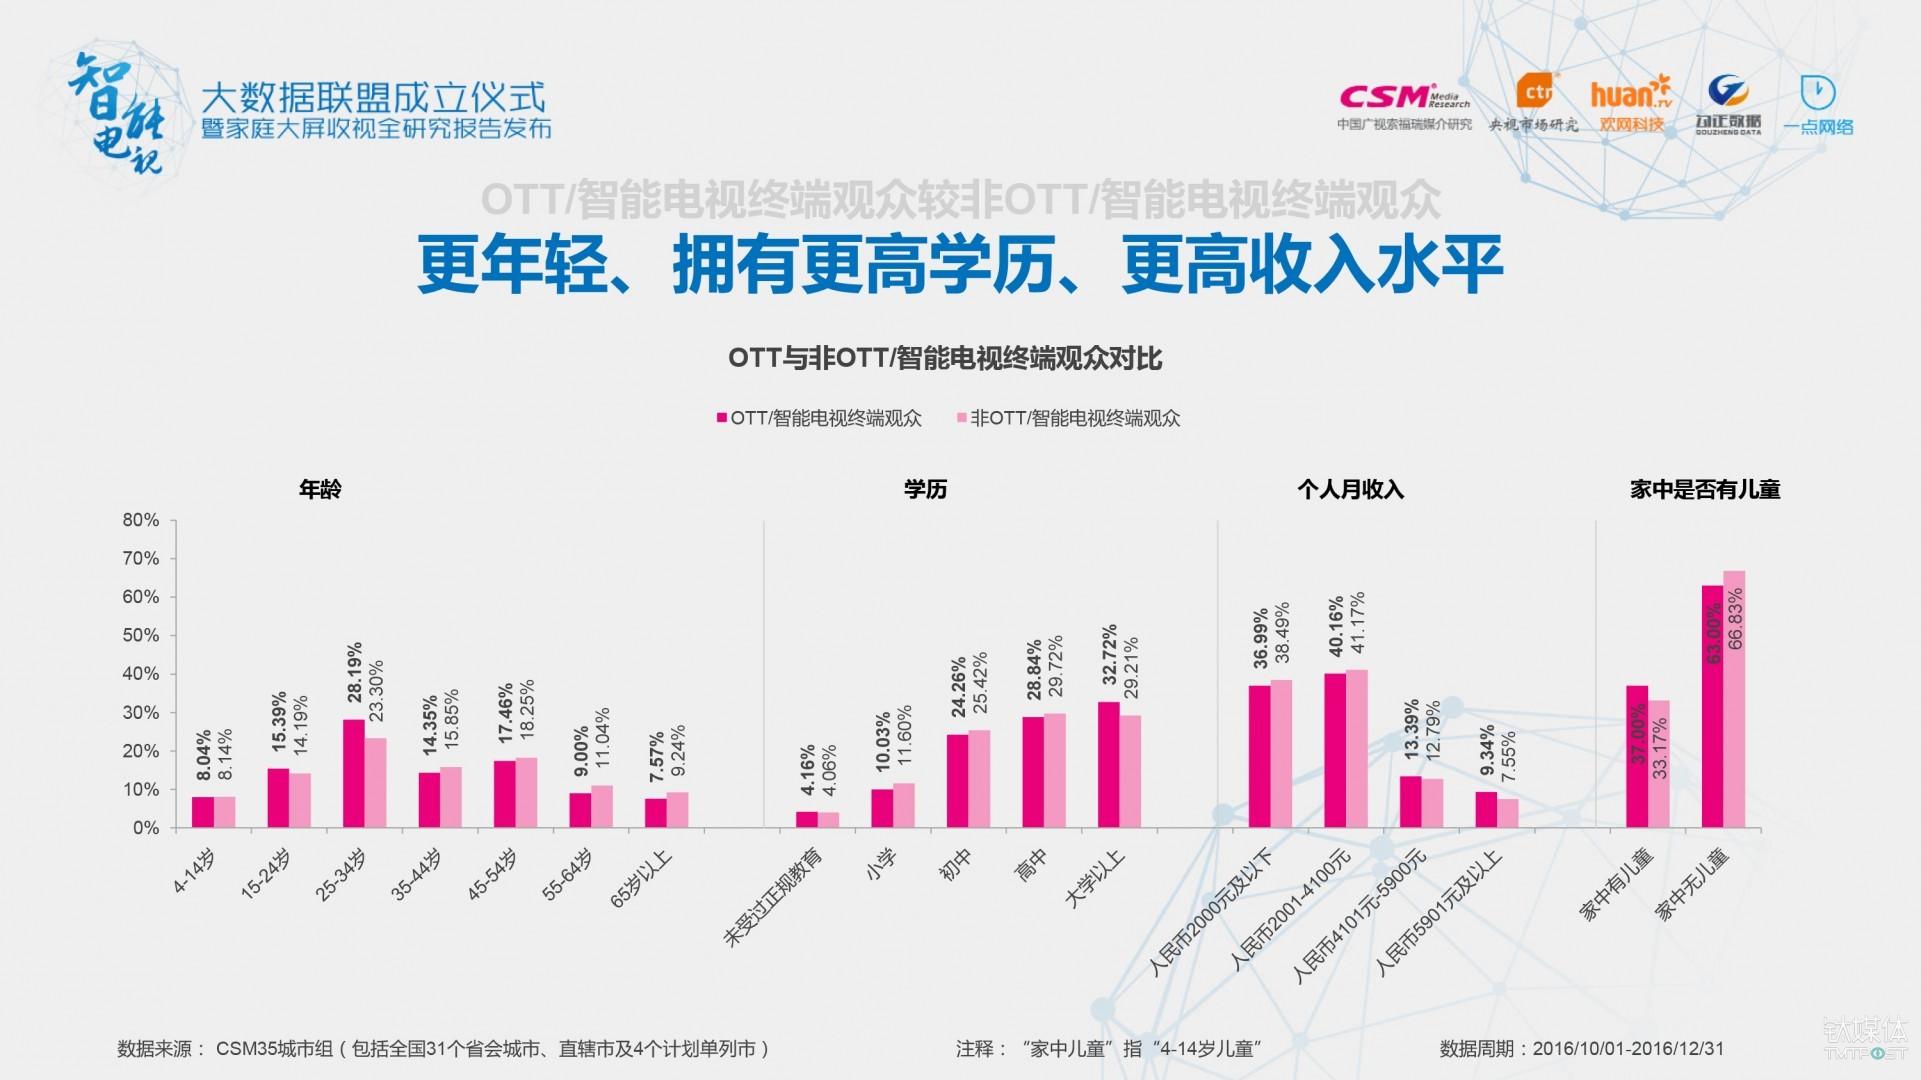 OTT/智能电视终端观众更年轻、更高学历、更高收入水平